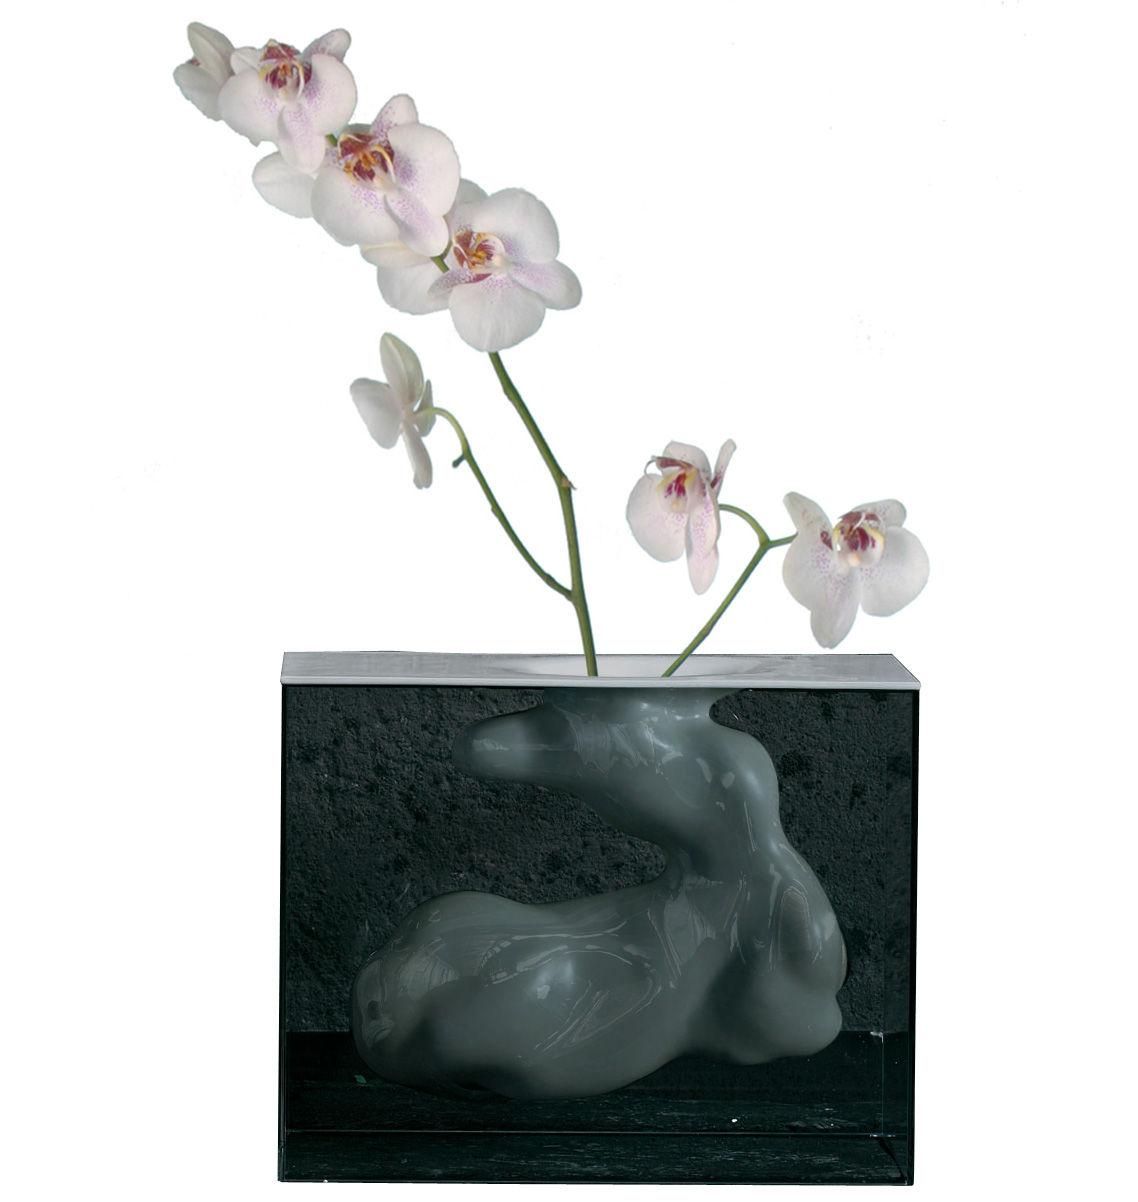 Decoration - Vases - Angela Vase - H 45 cm by Glas Italia - Smoked glass - White - Ceramic, Tempered glass